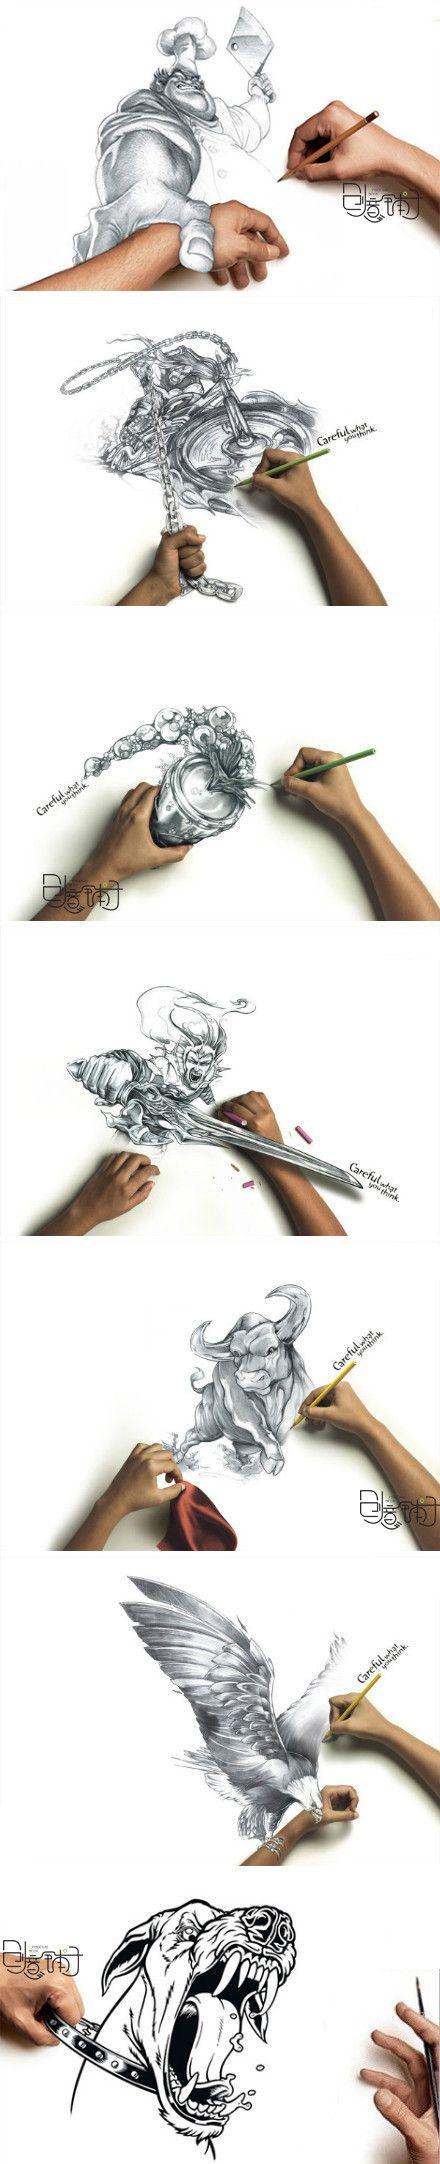 Amazing art! So cool!